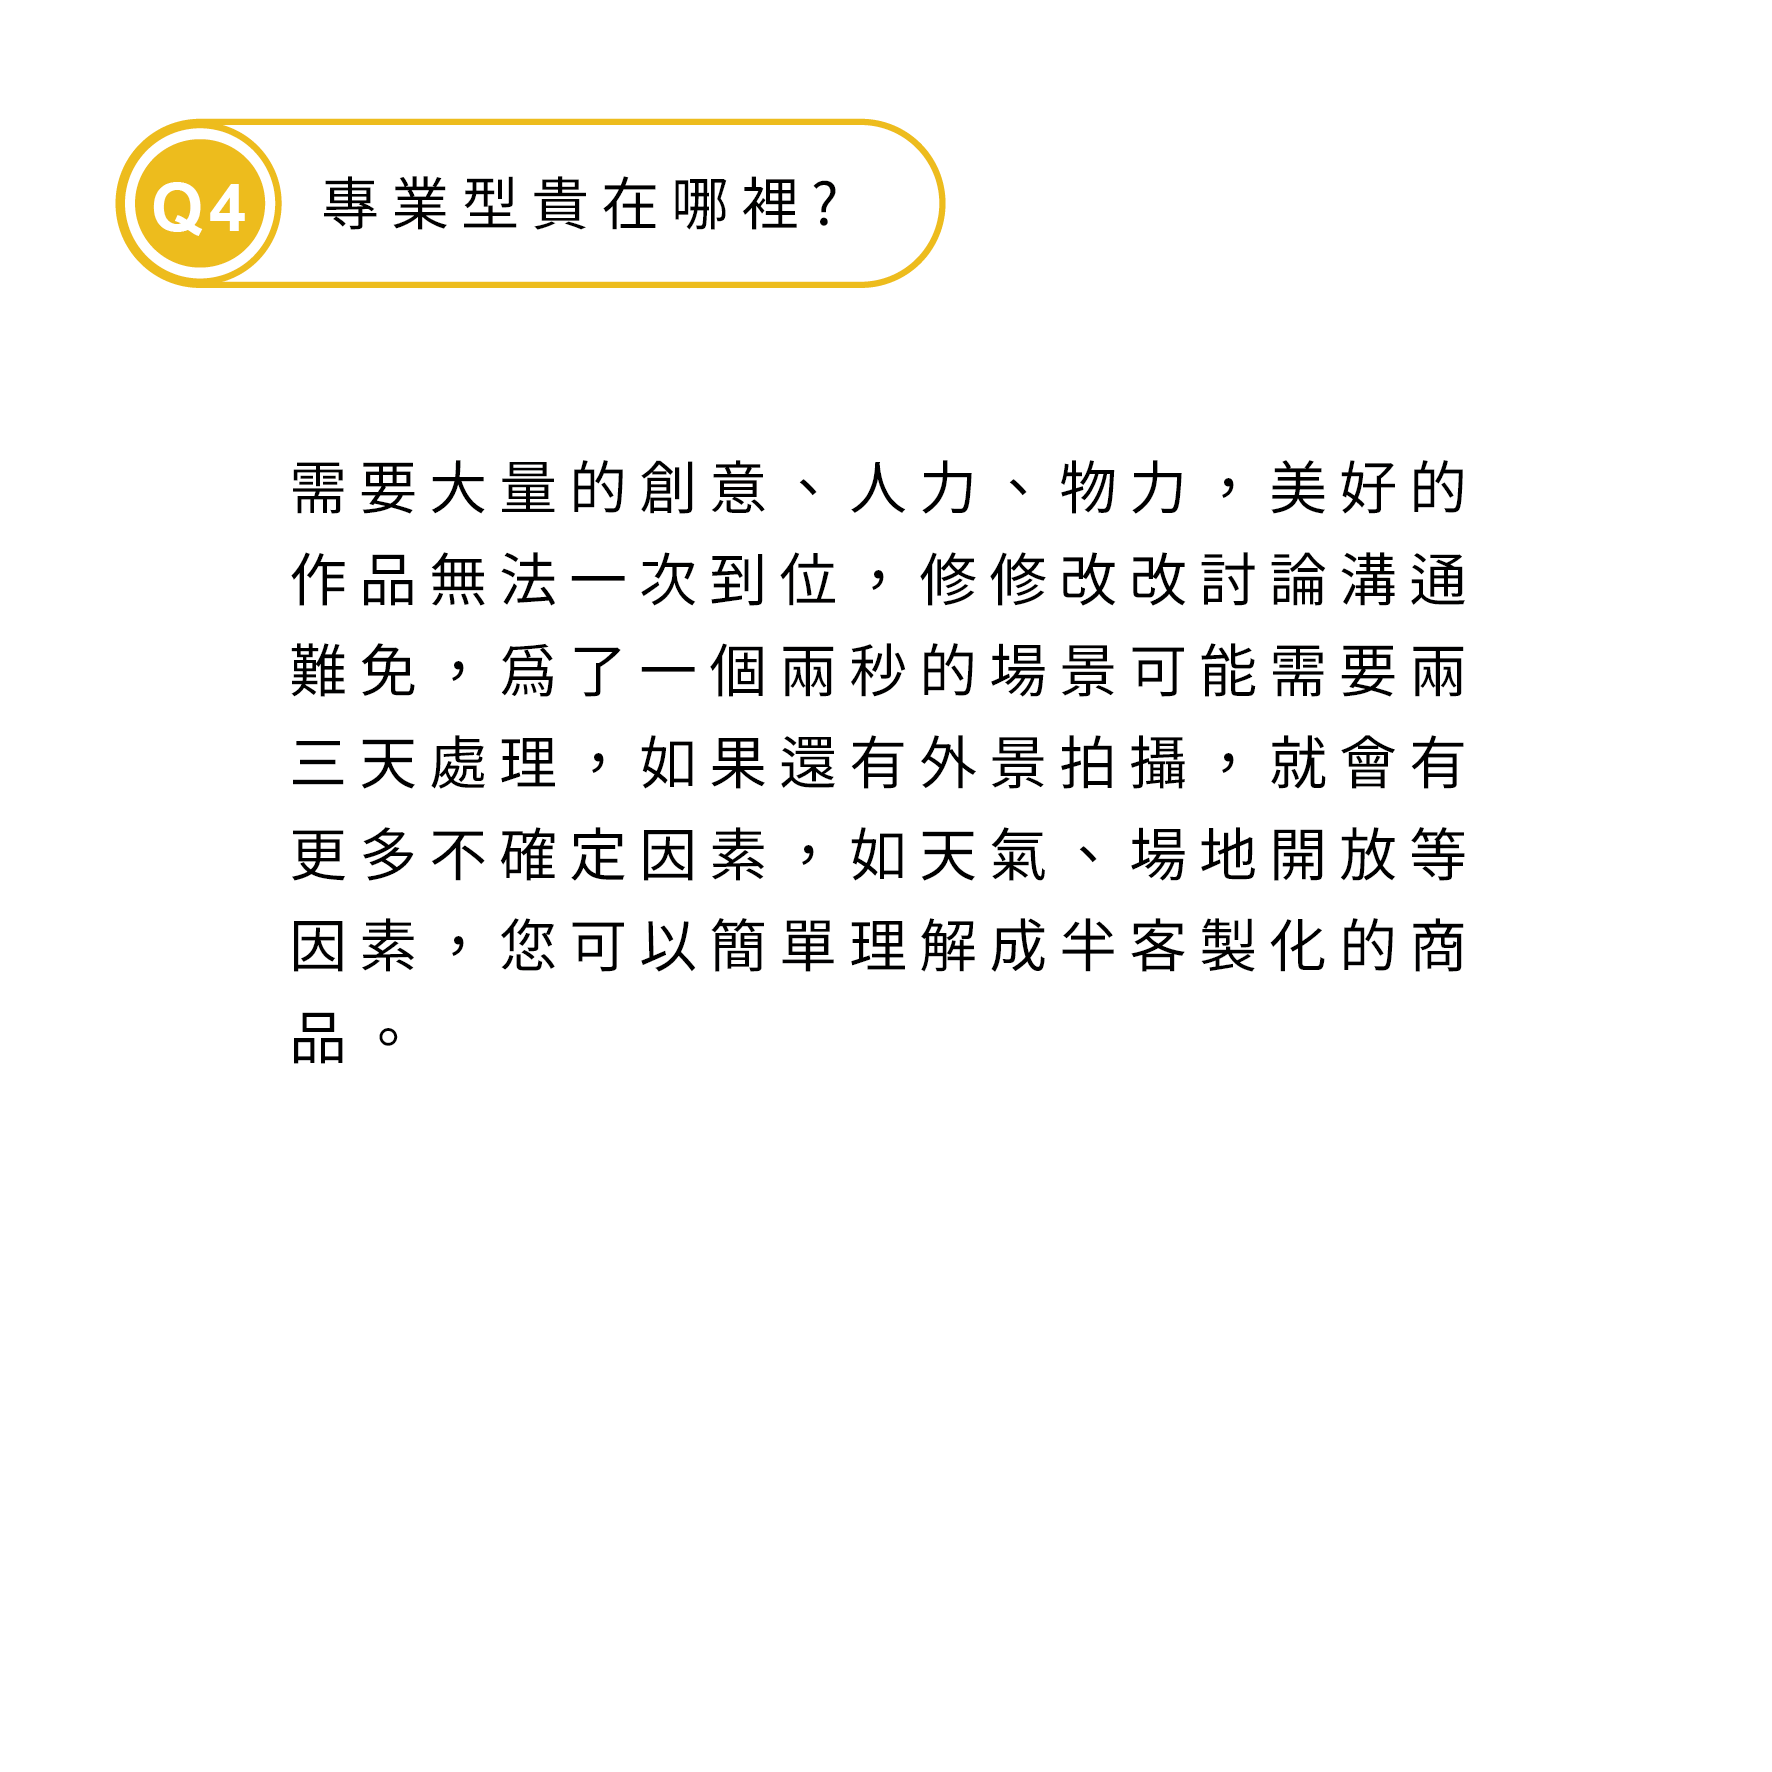 Q4 (1)